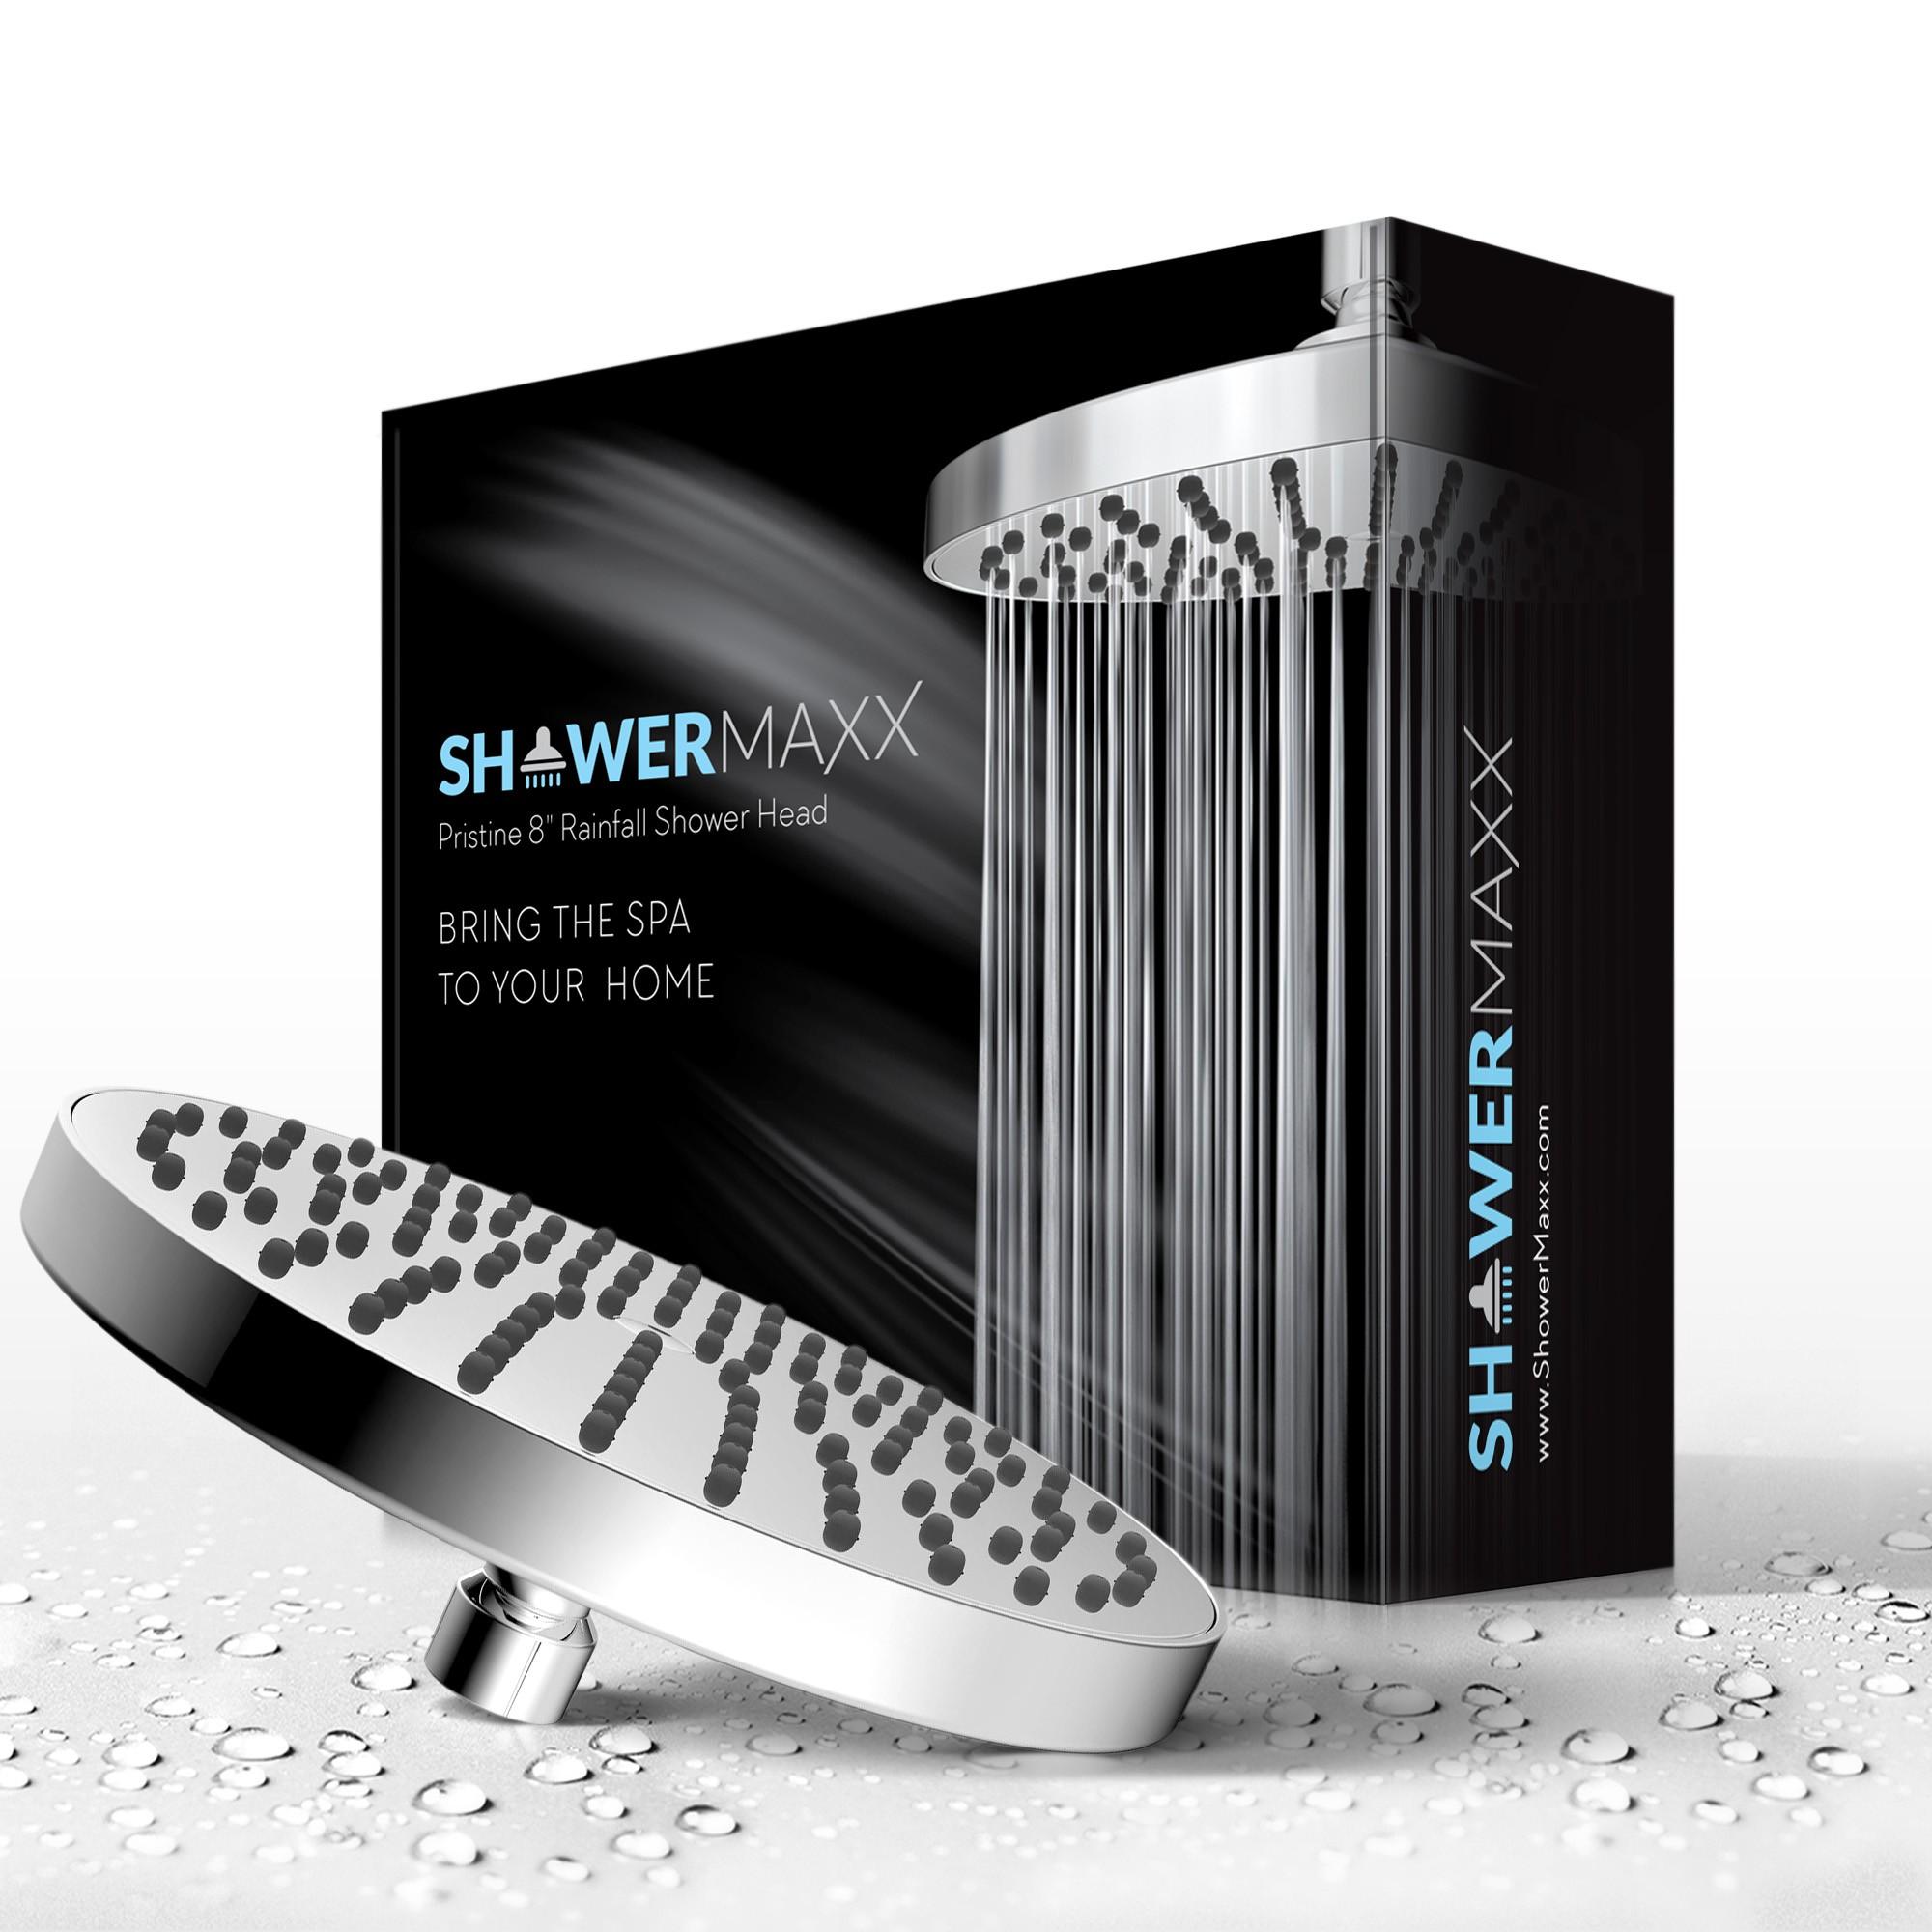 Three New Shower Heads - Packaging